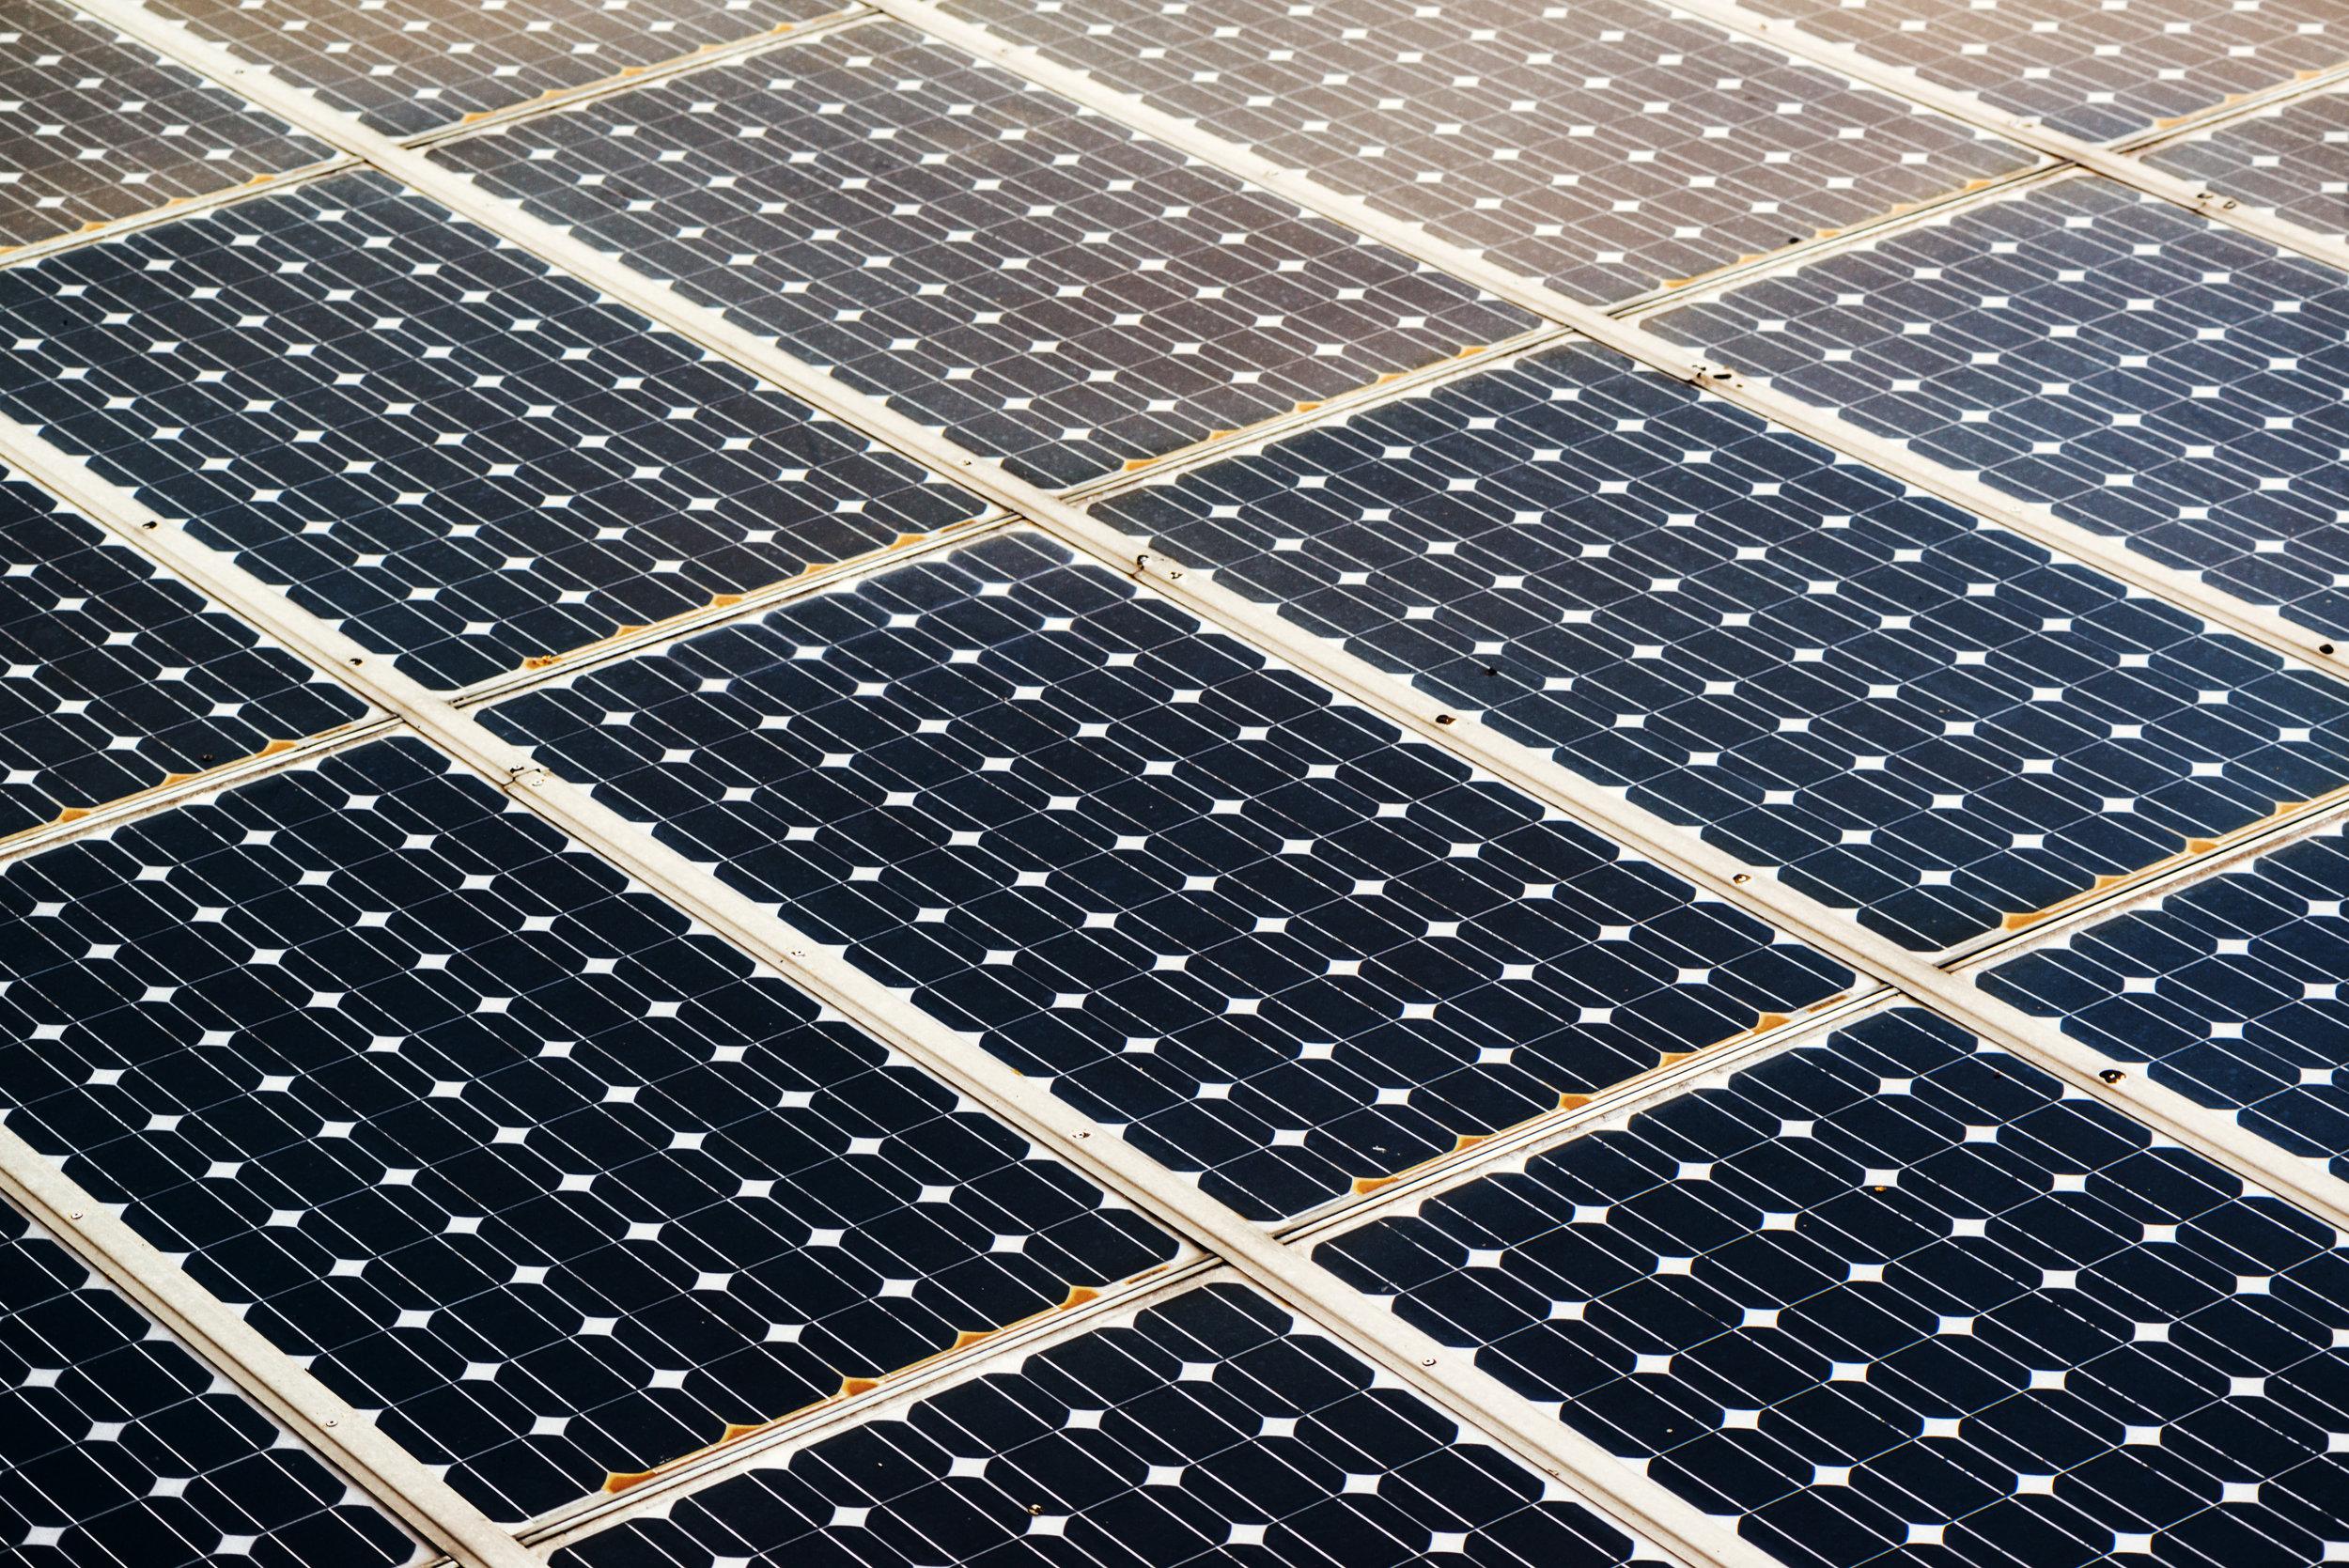 solar-panel-surface-P99FYMX.jpg